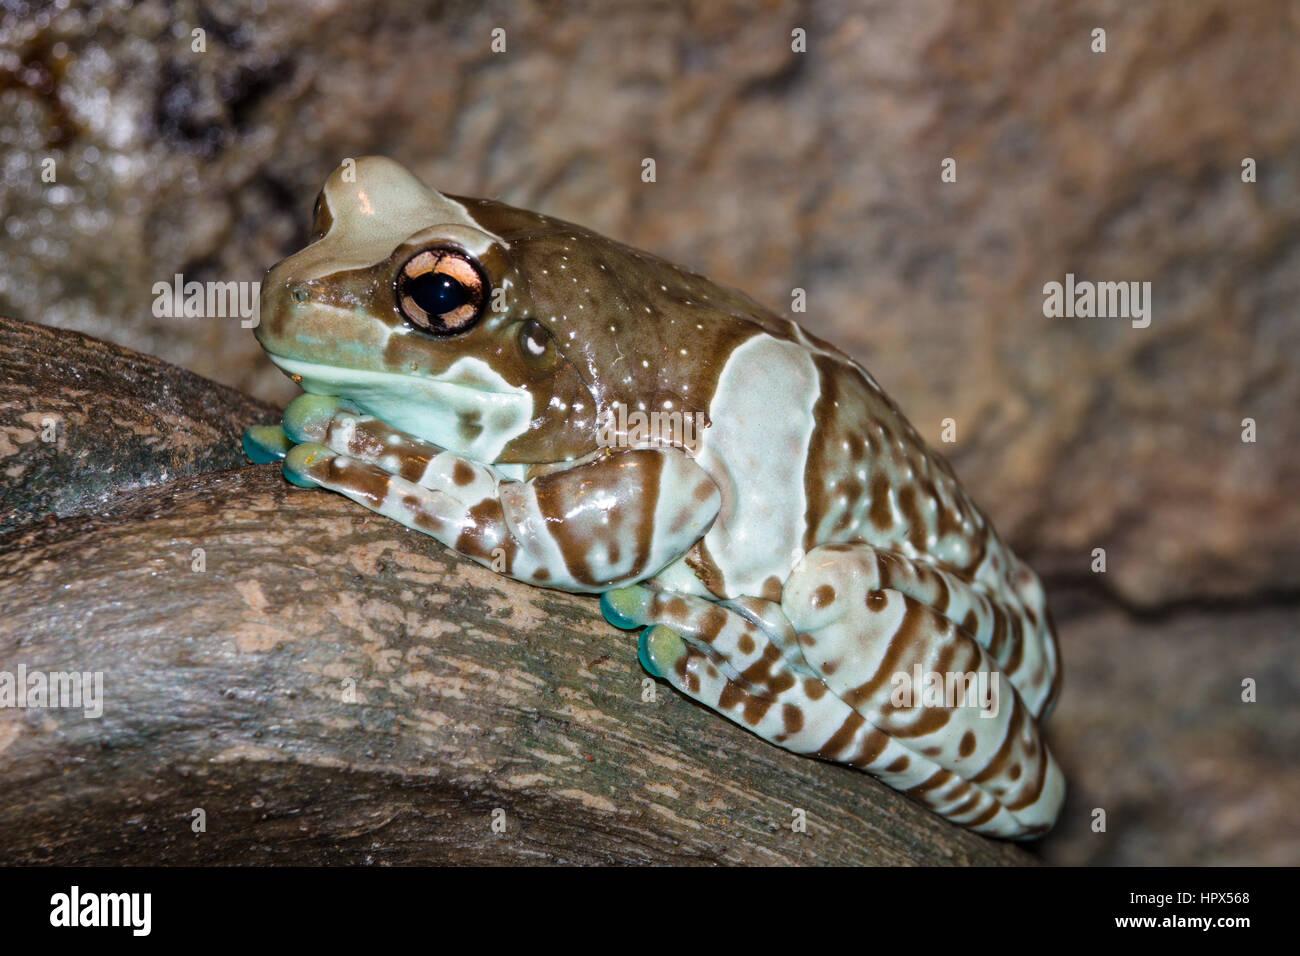 Closeup of Amazon Milk Frog - Stock Image